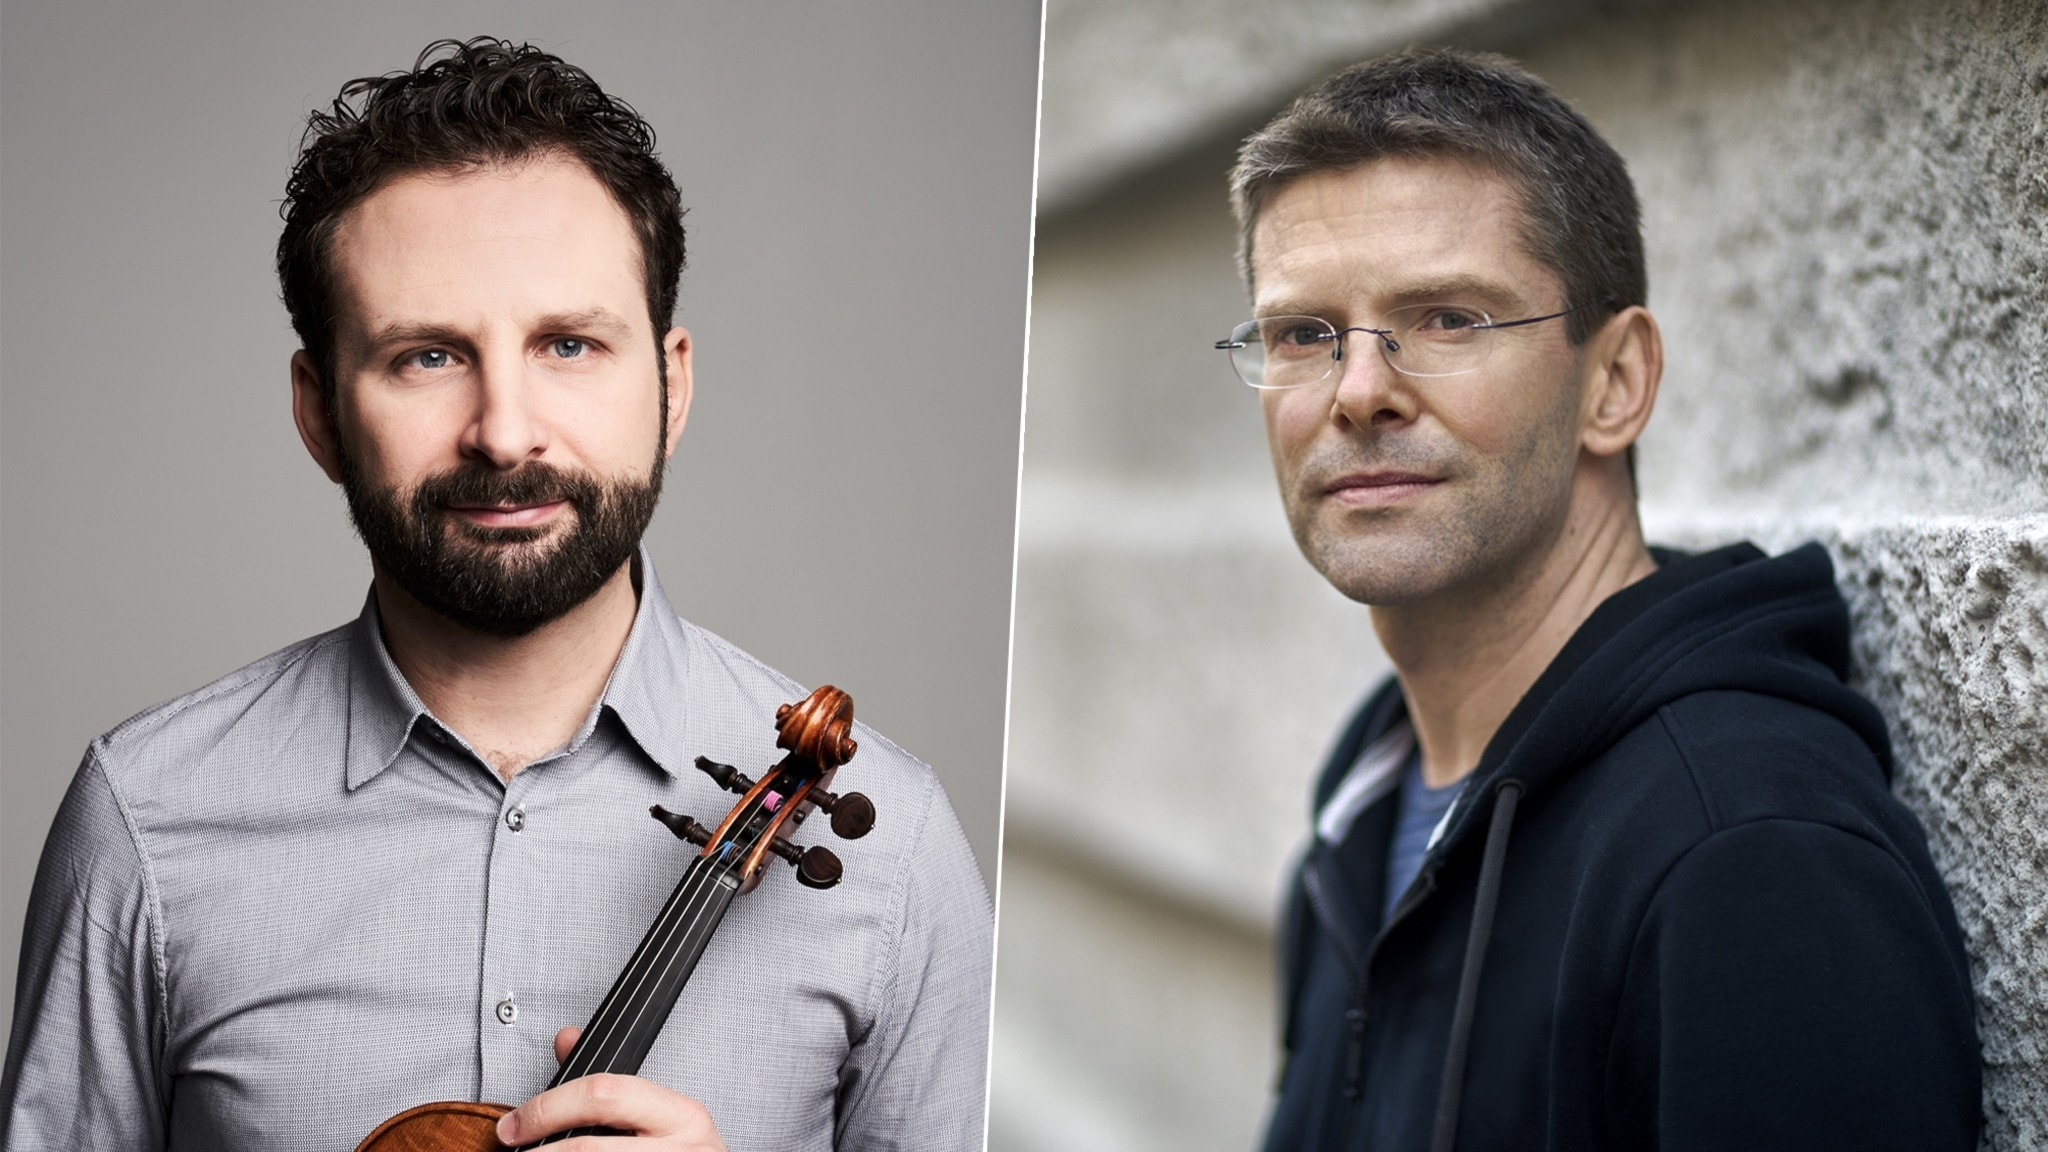 Bild: Ilya Gringolts är solist i Albert Schnelzers violinkonsert.